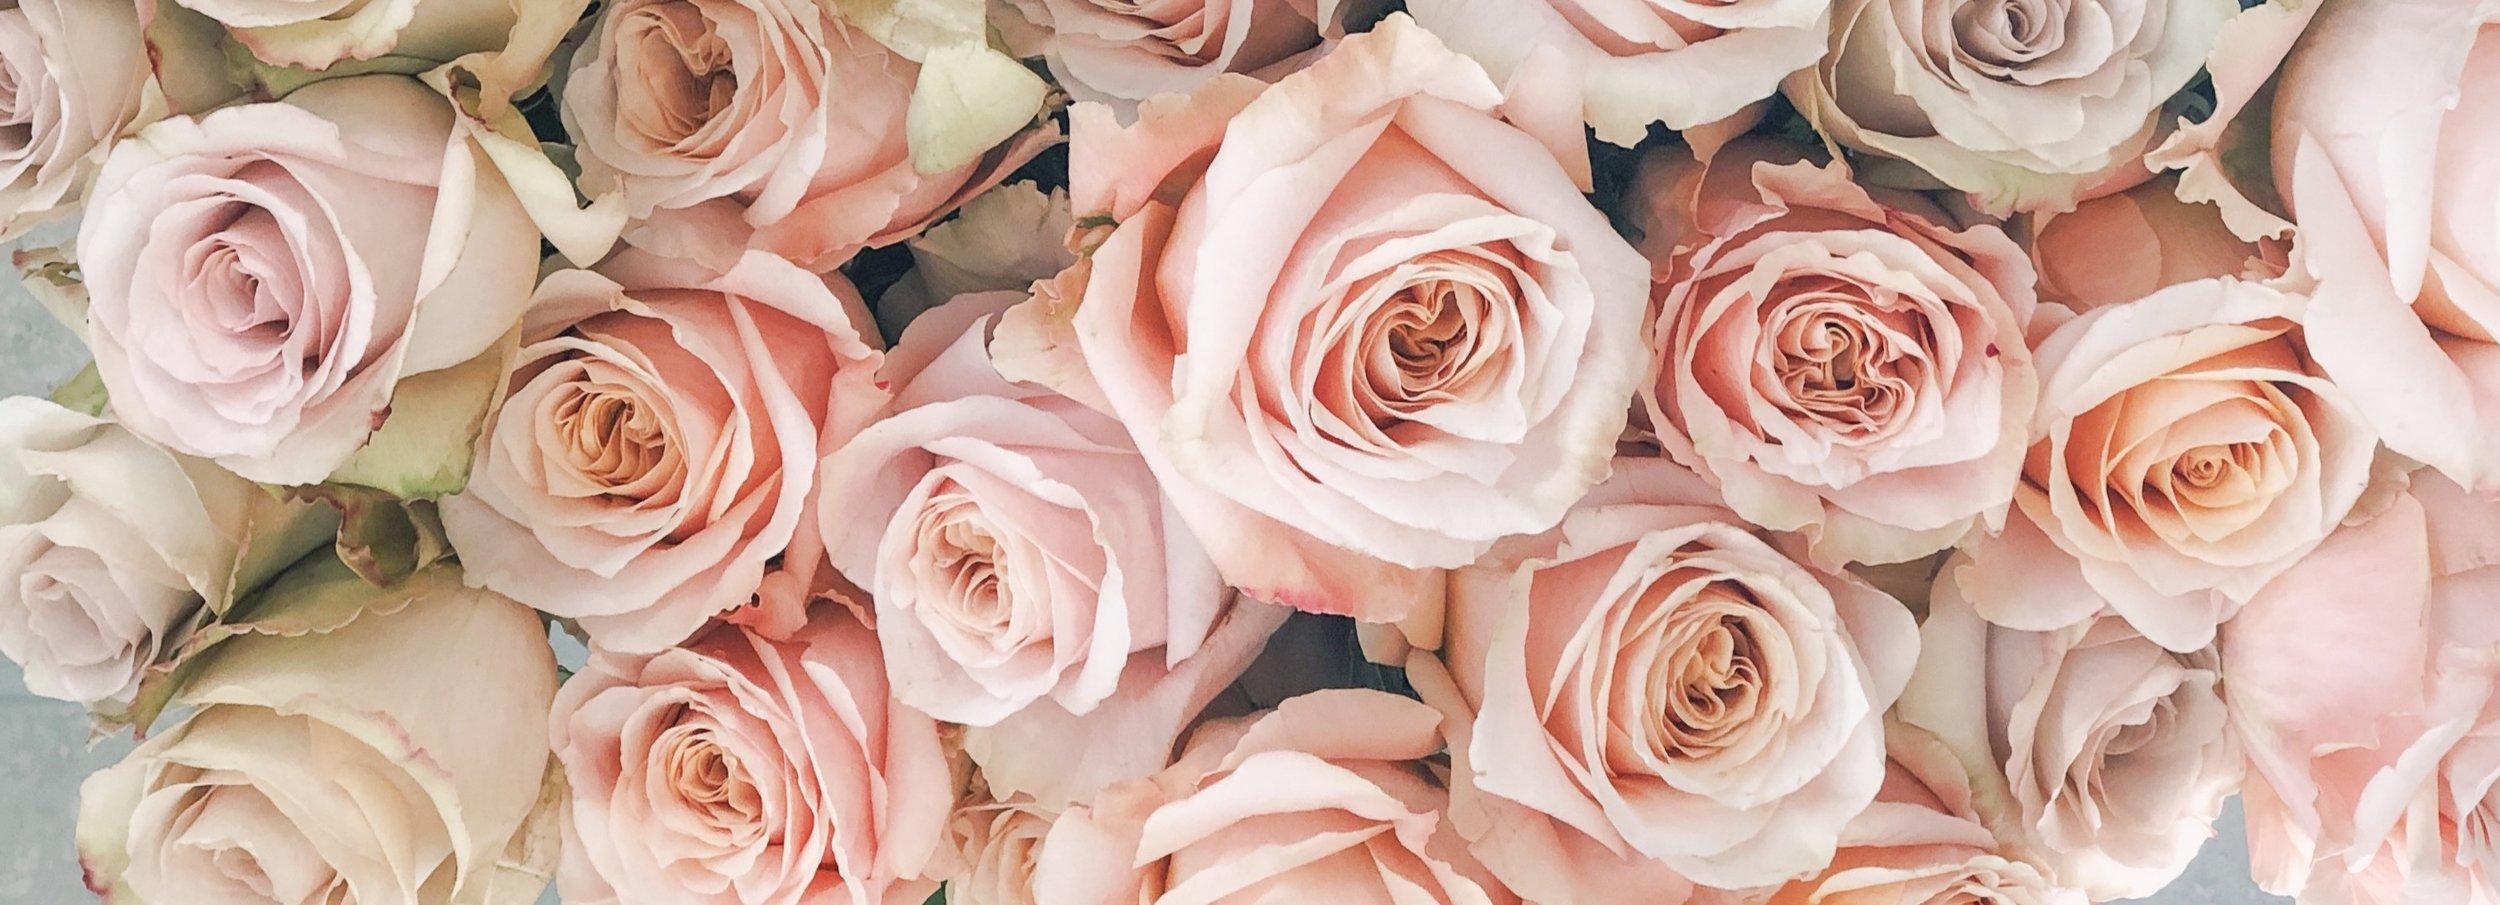 Wildflowers+Fairhope%2C+Valentine%27s+Day+2019